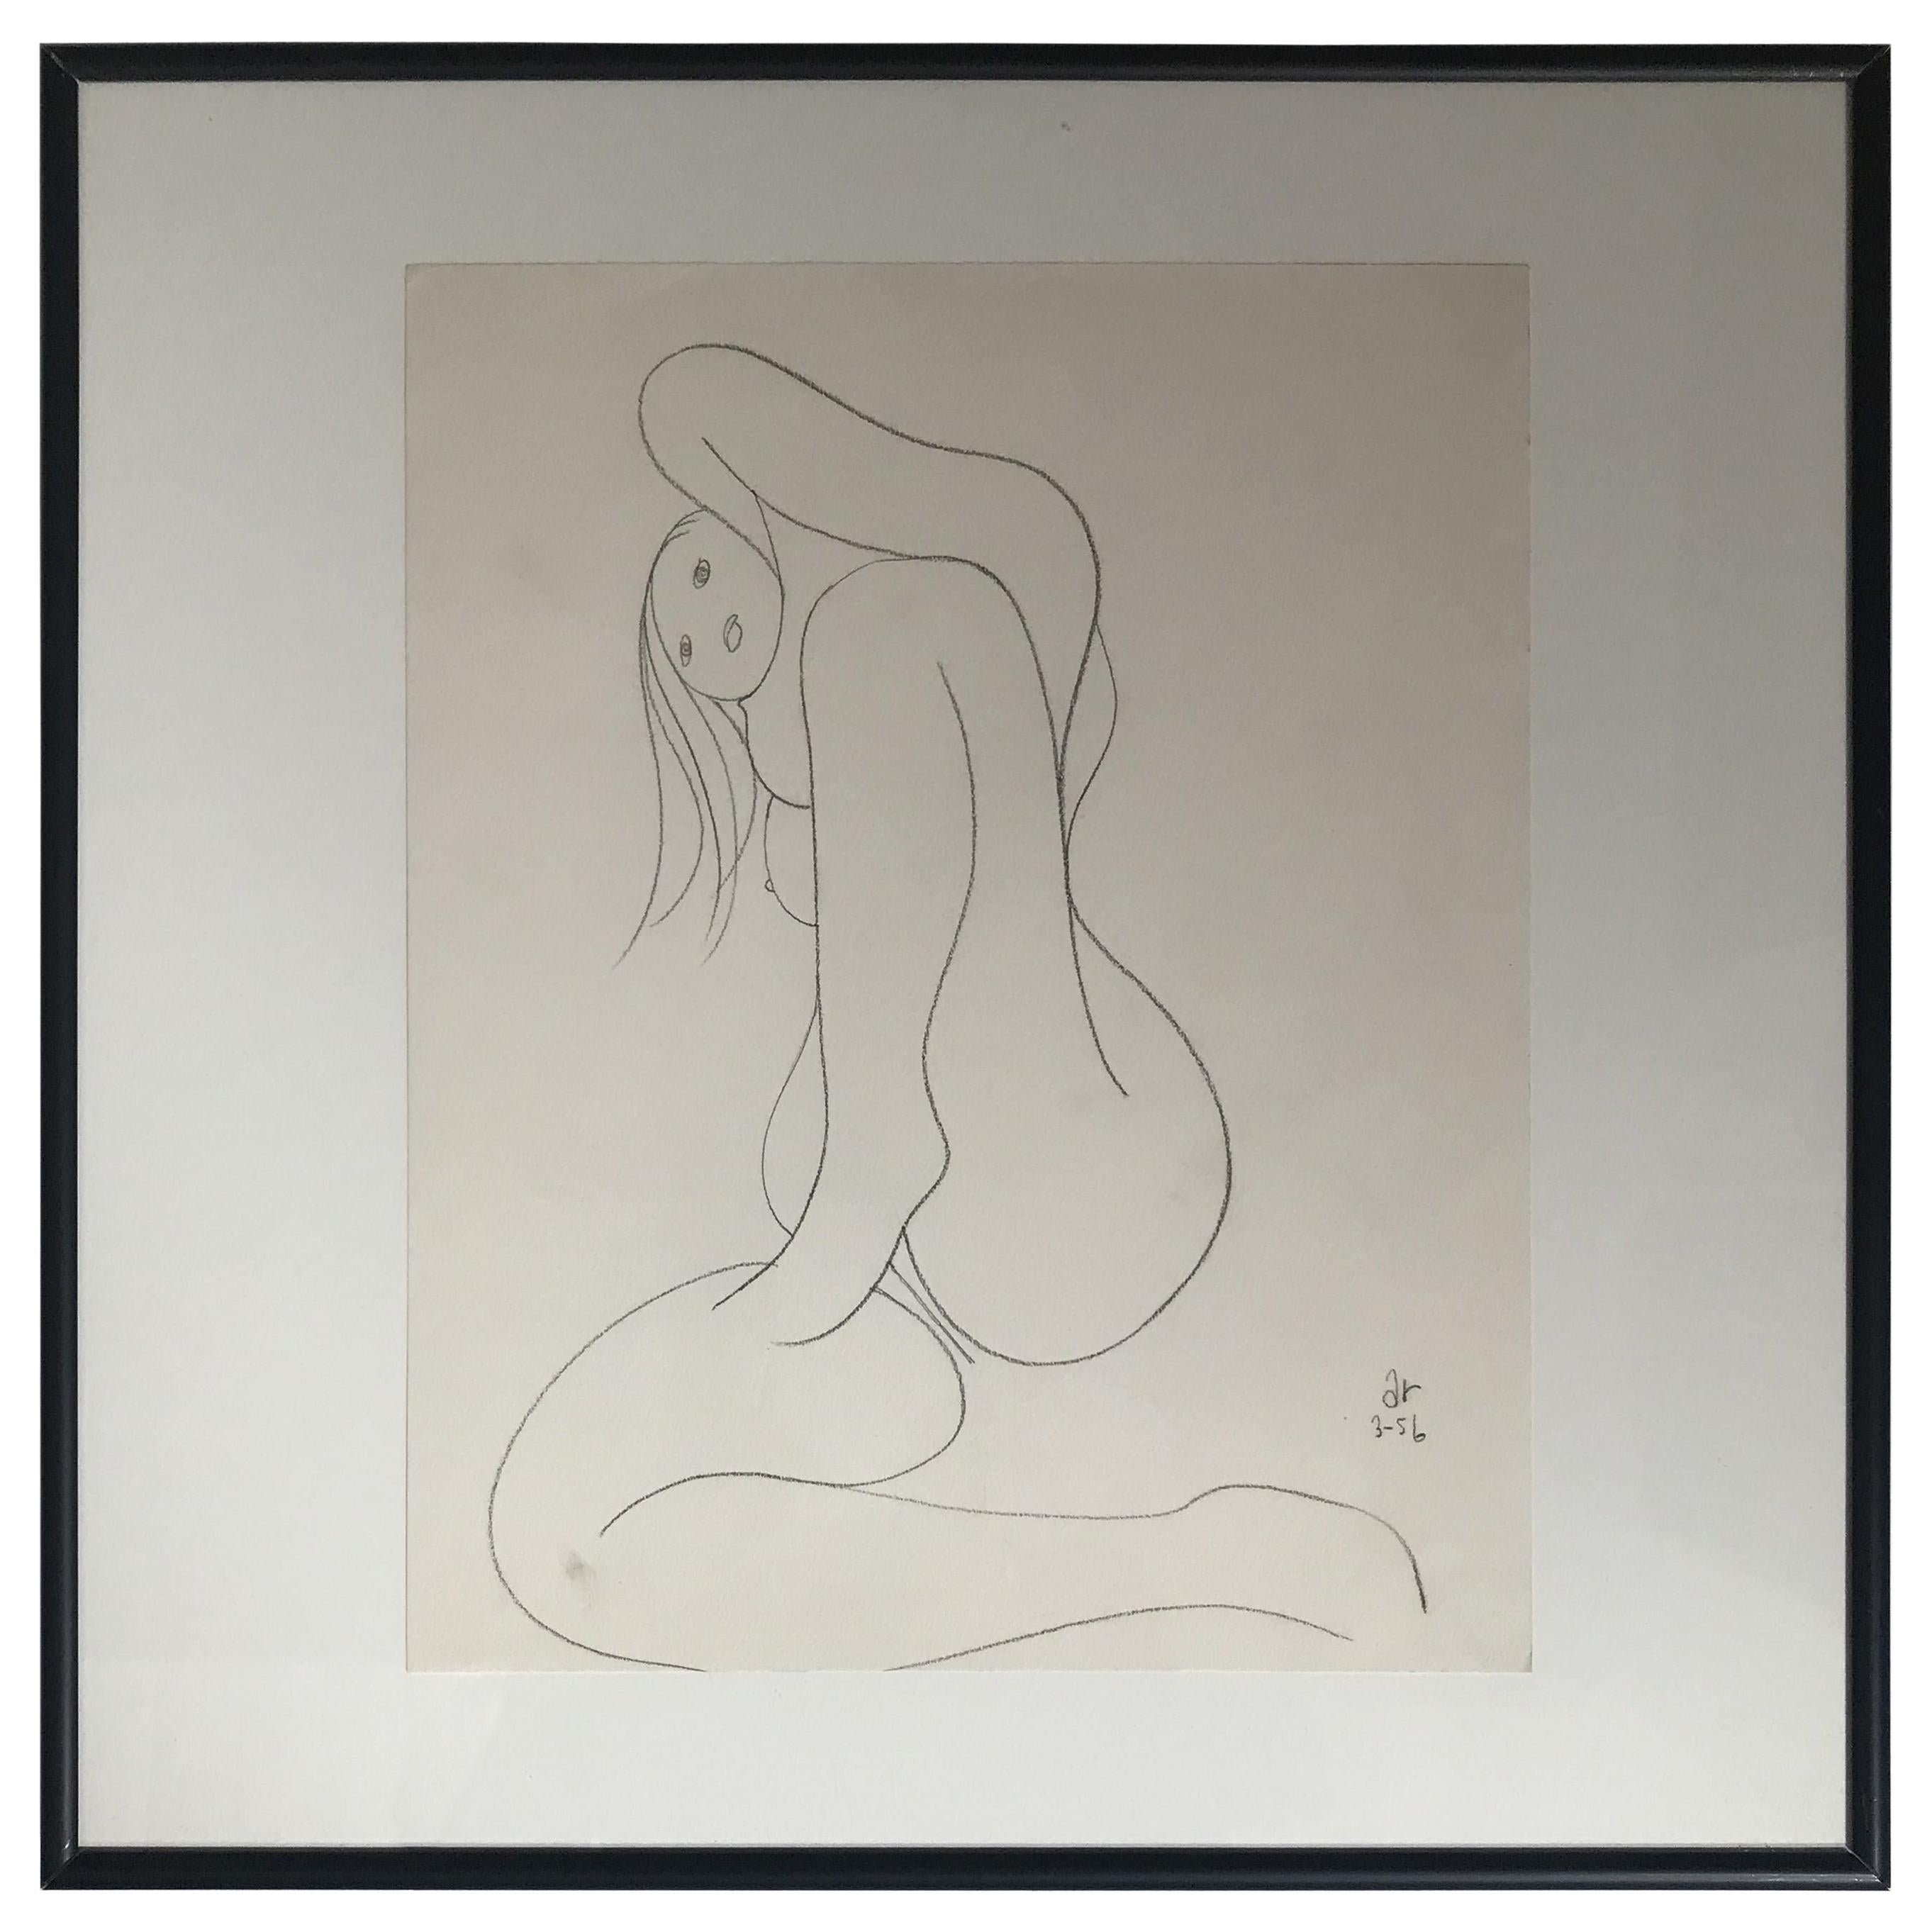 Nude Drawing by Albert Radockzy #4